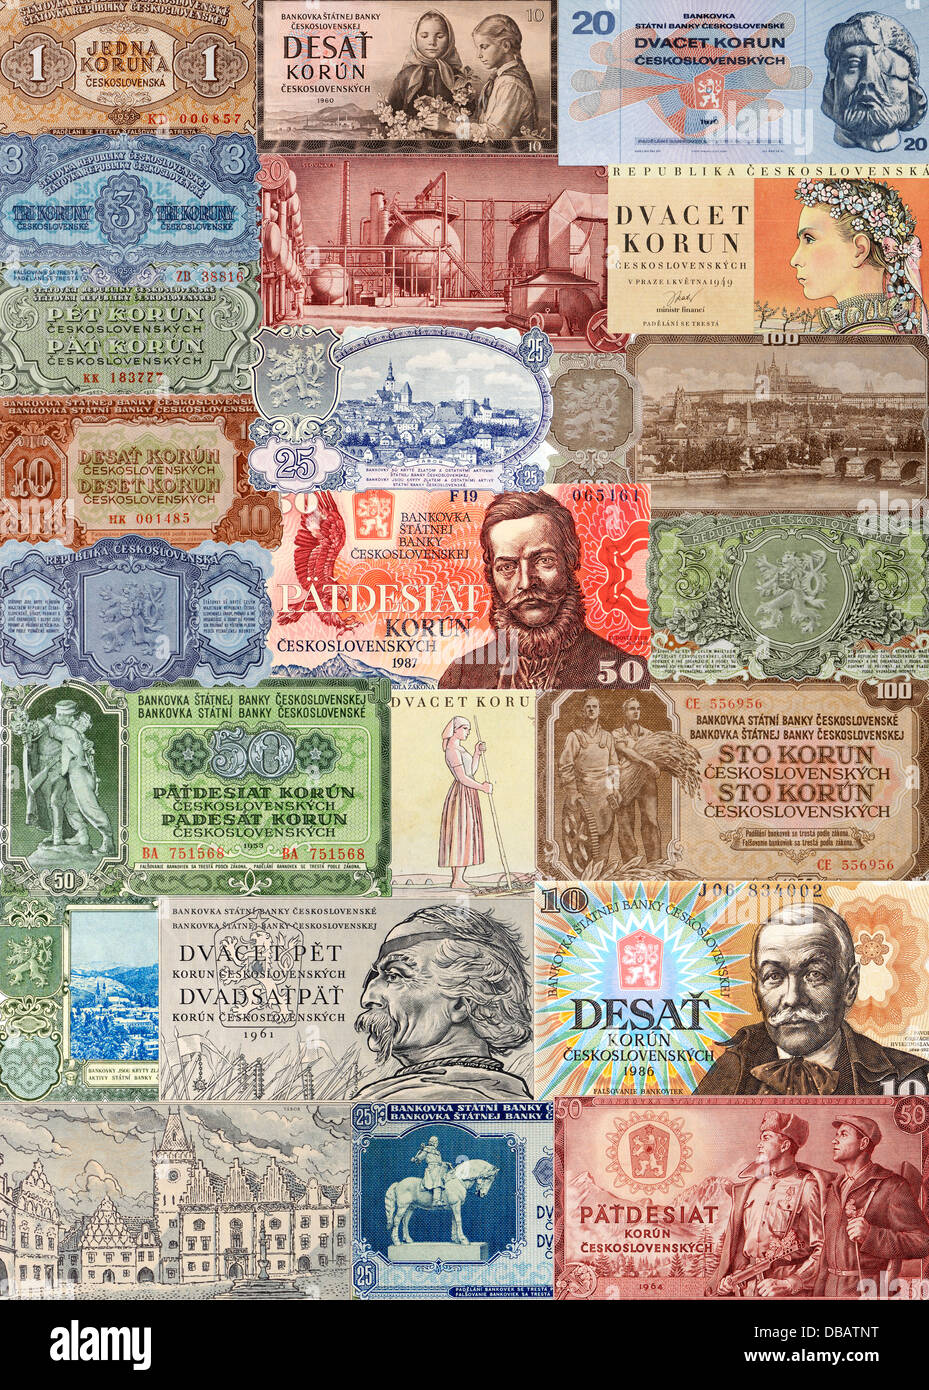 Czechoslovakian banknotes - Stock Image